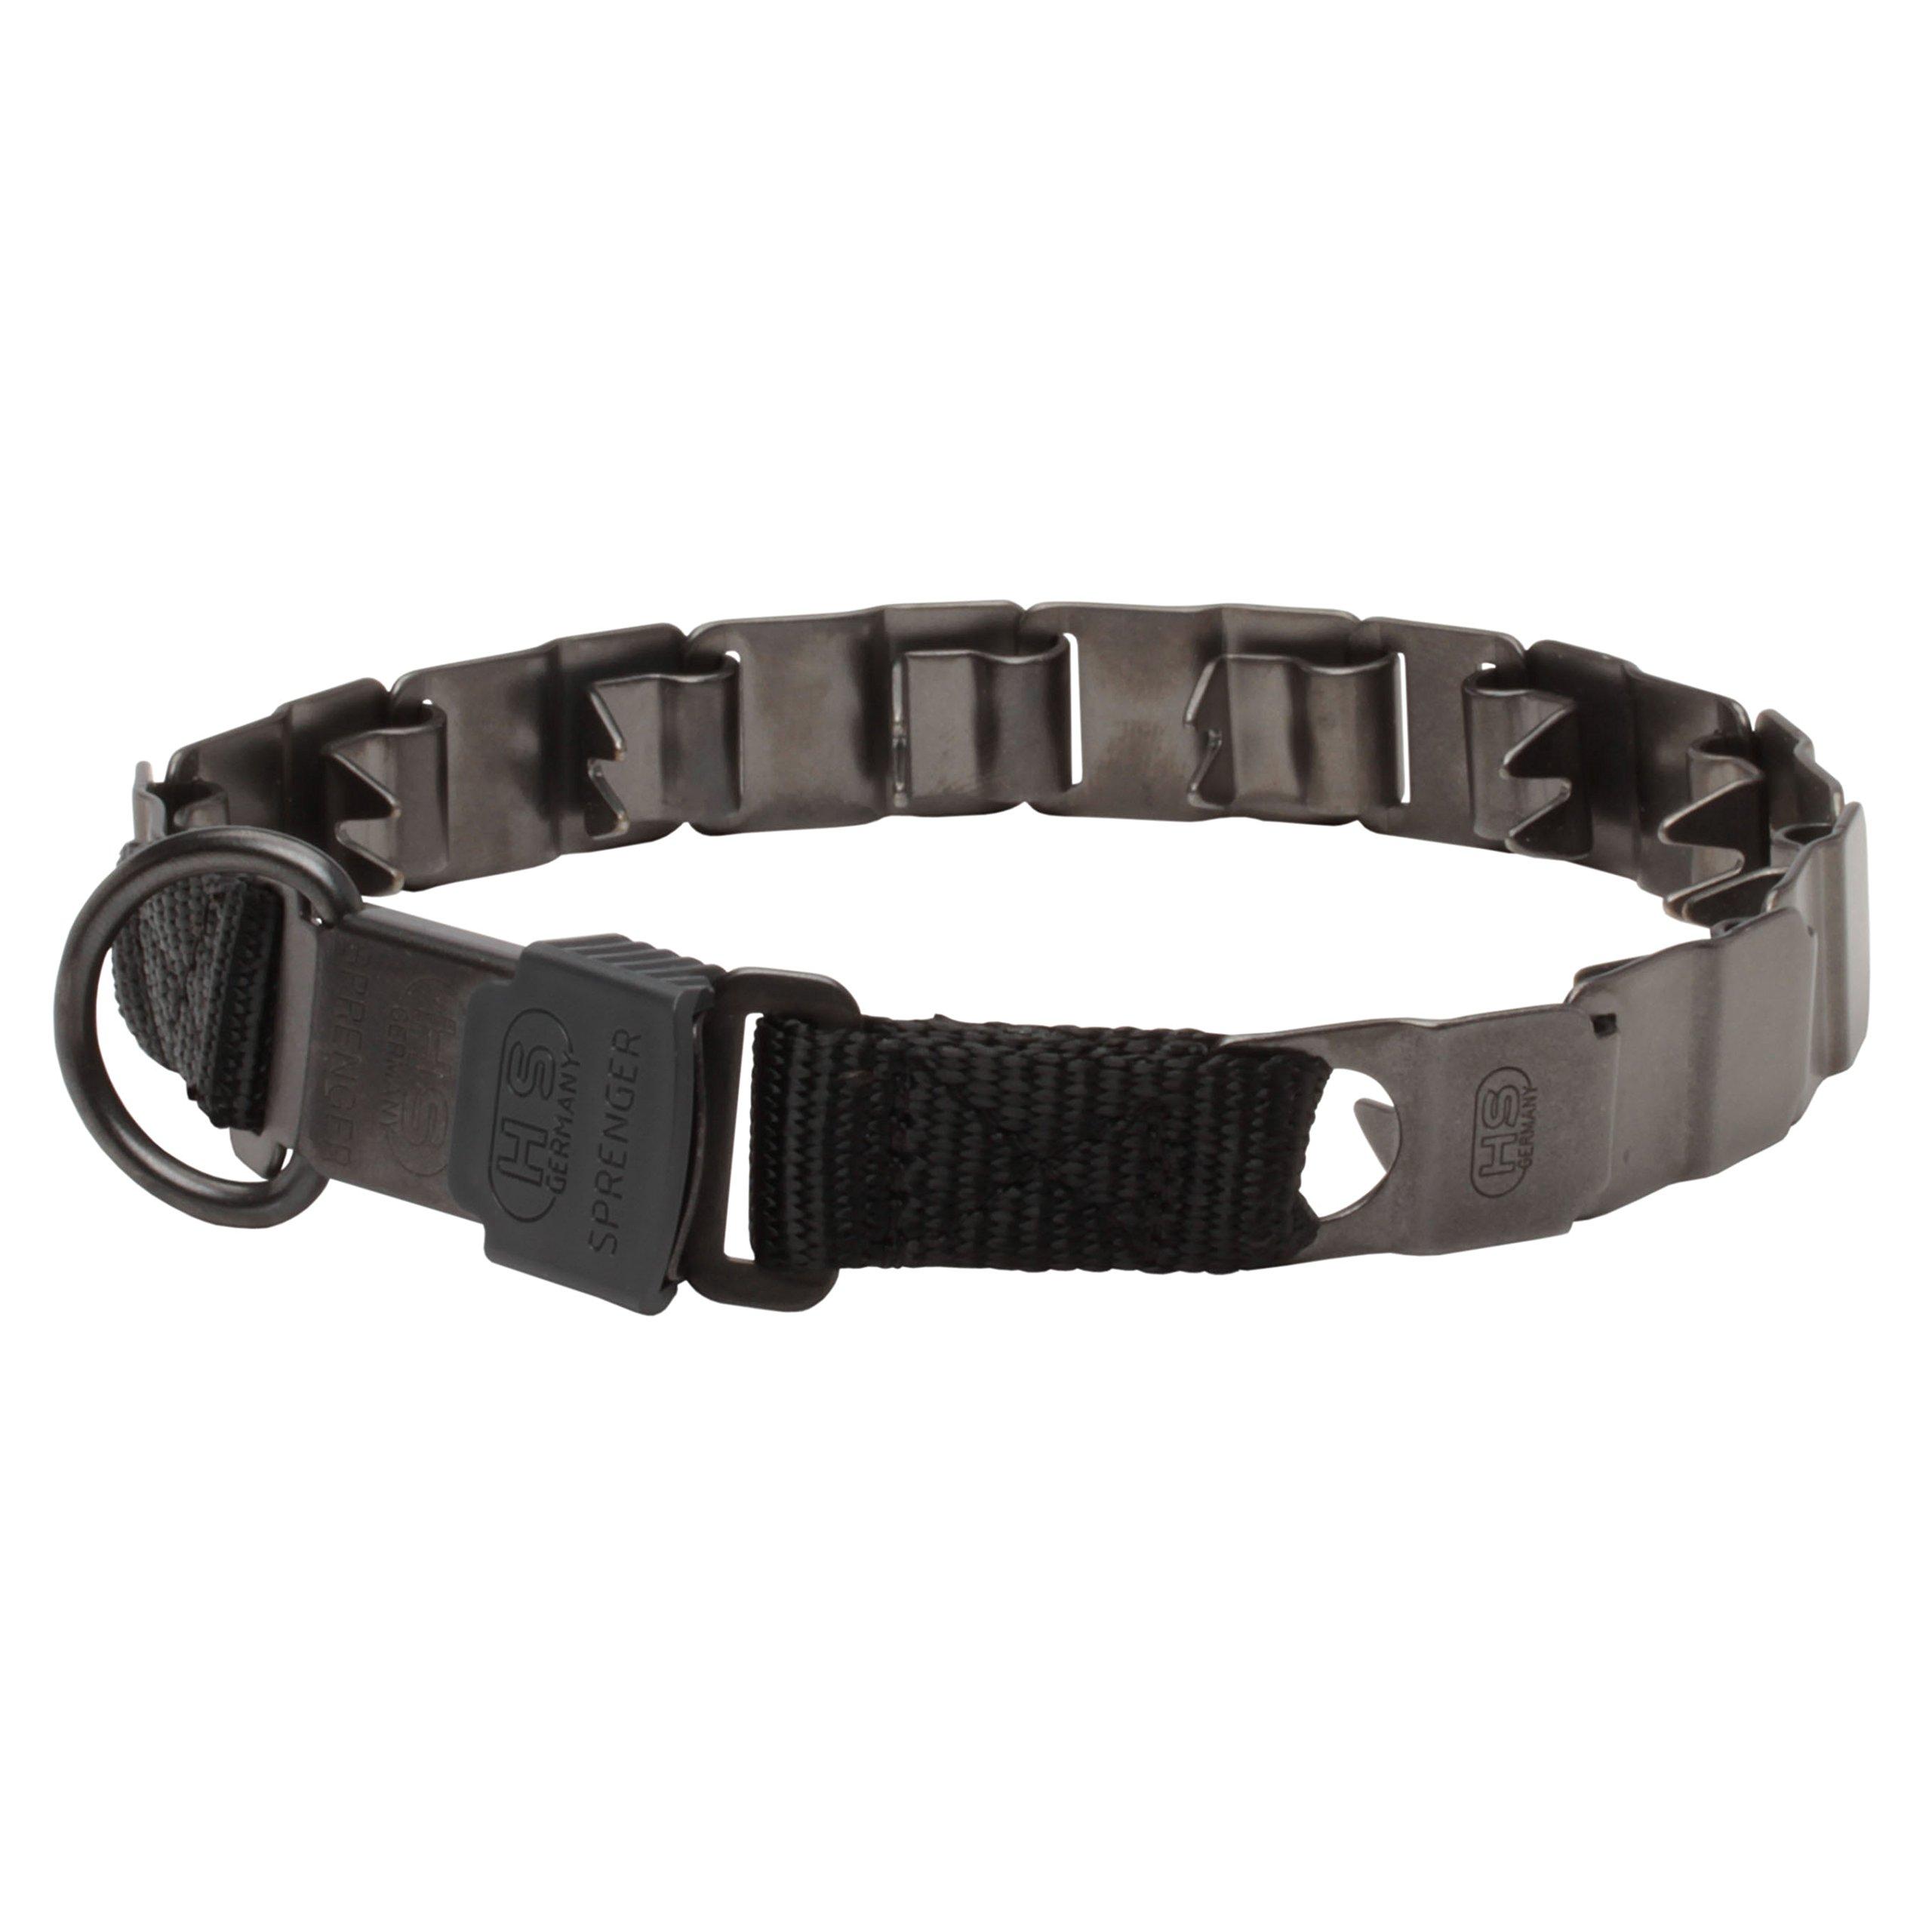 Herm Sprenger 'Gentle Kind' Neck Tech Sport Labrador Pinch Collar - HS 50050 010 66 - Size 19 inch (48cm)